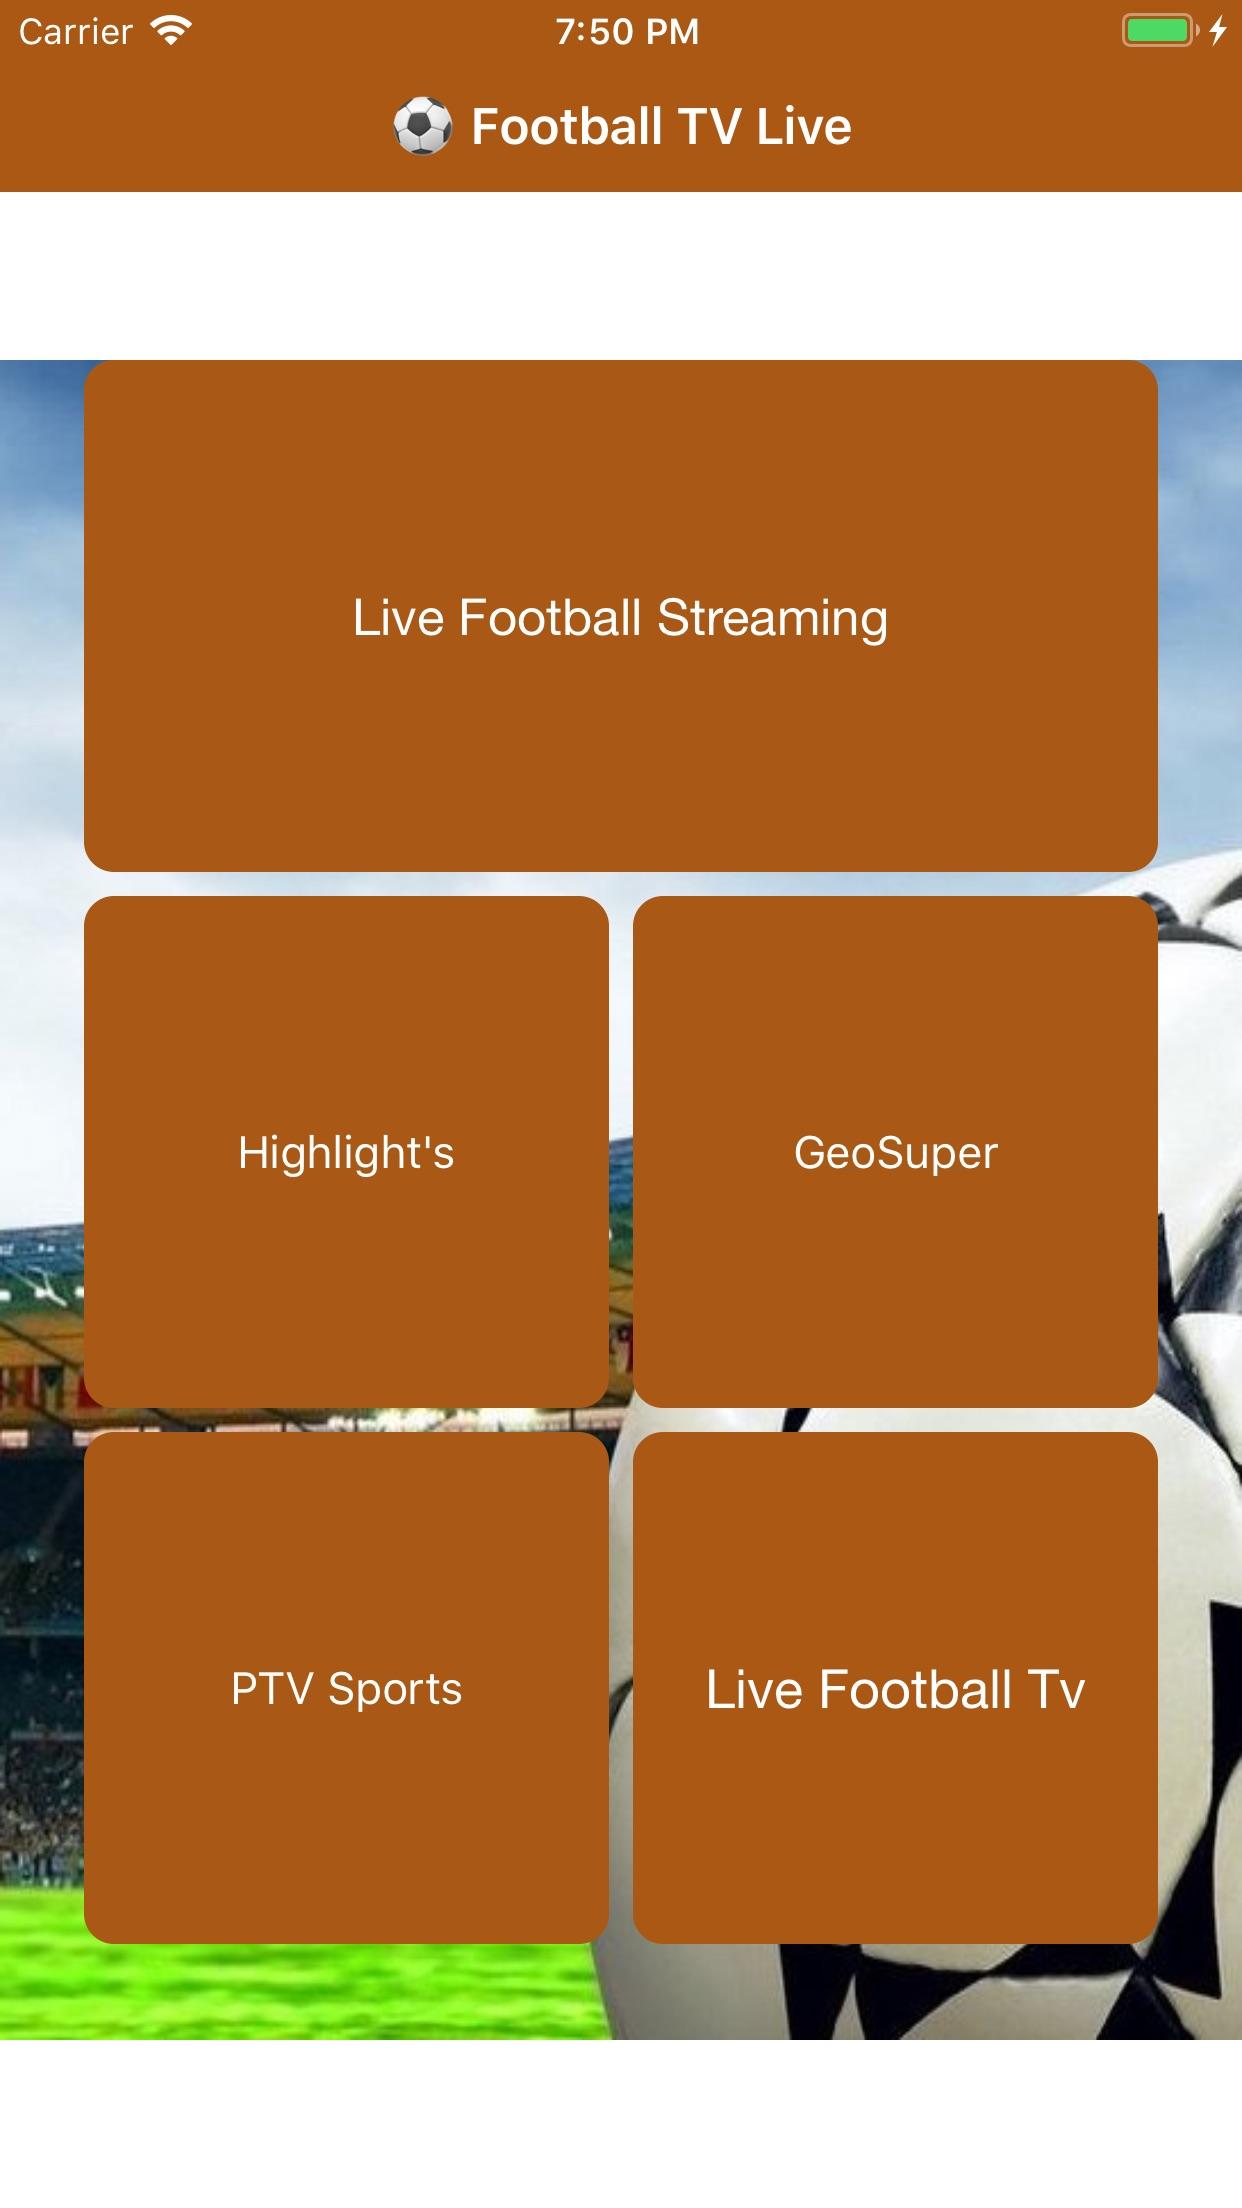 Football TV Live StreaminginHD Screenshot